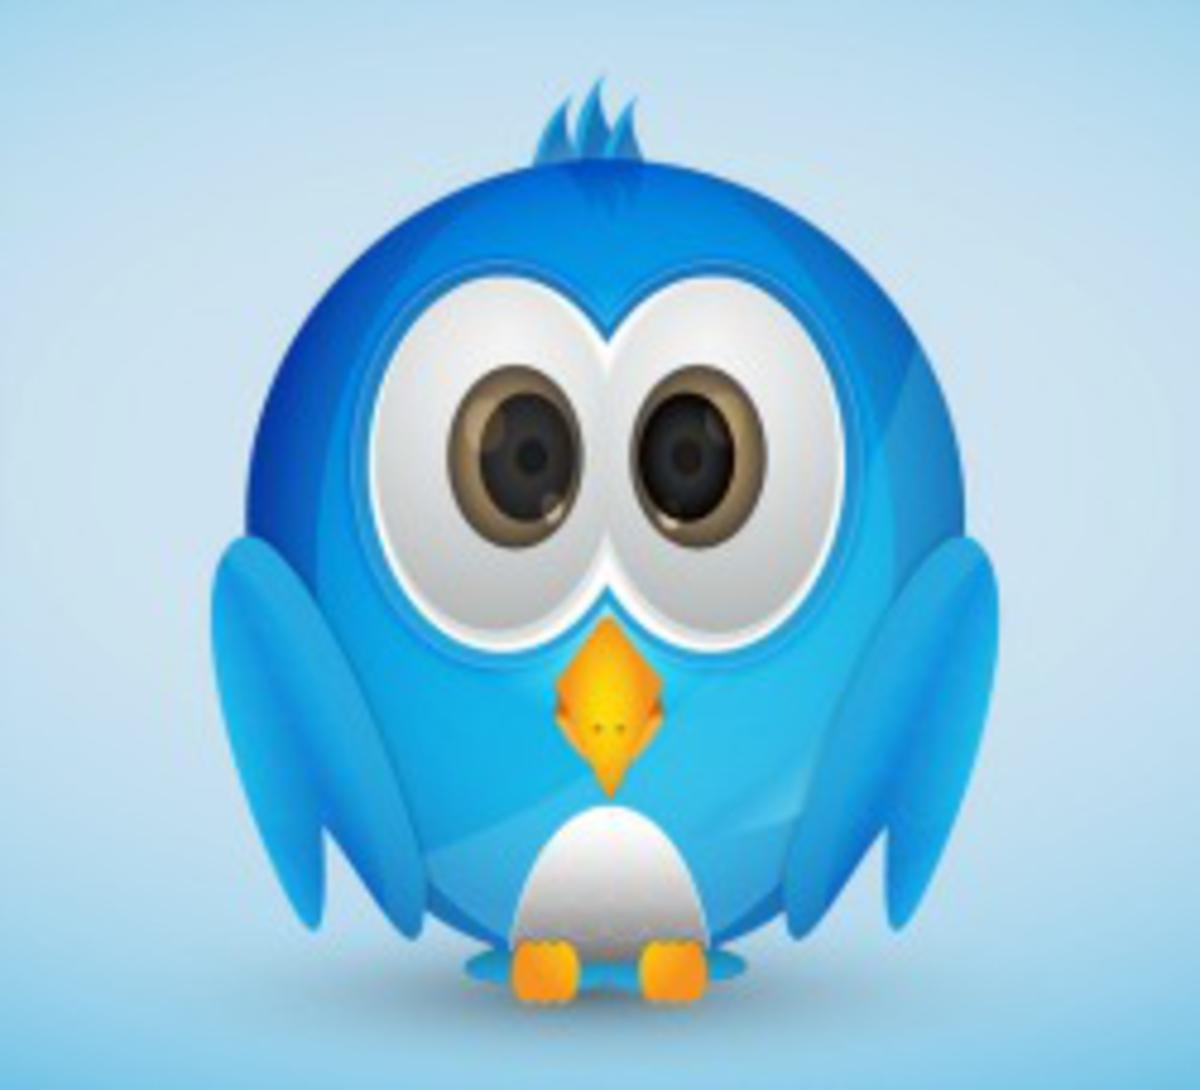 Social Media Shakeup